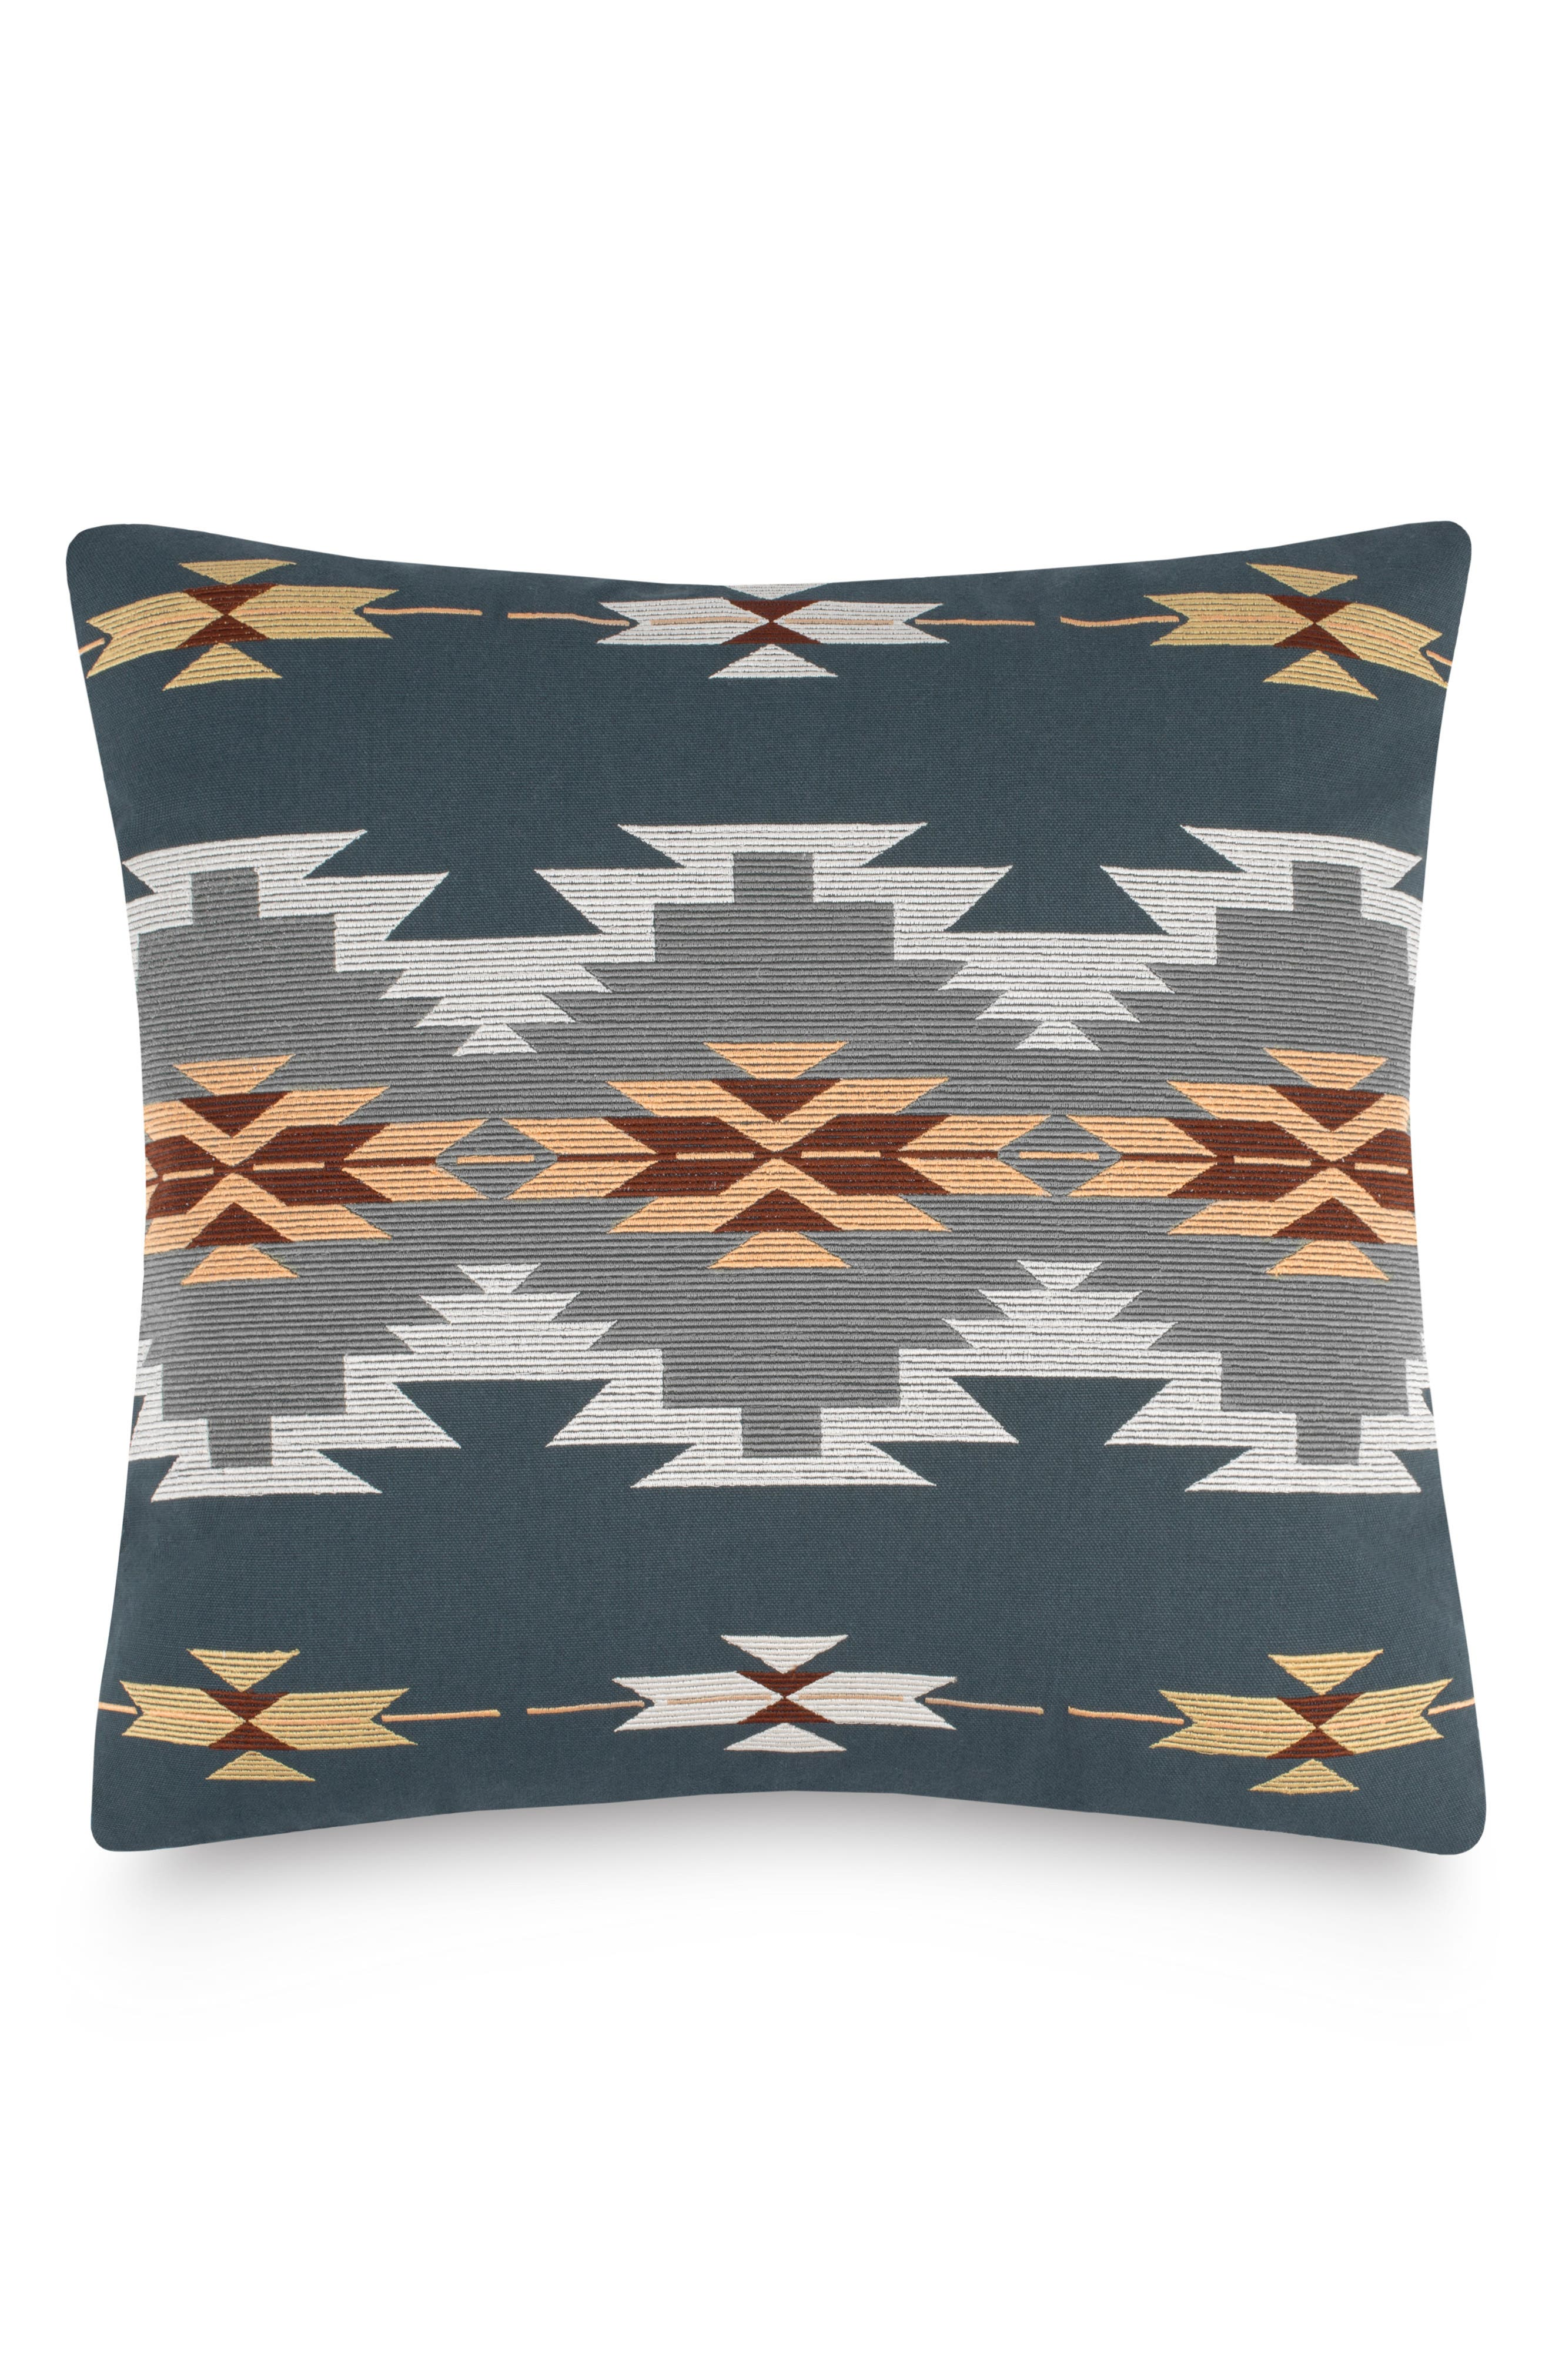 Crystal Peak Accent Pillow,                         Main,                         color, Dark Slate